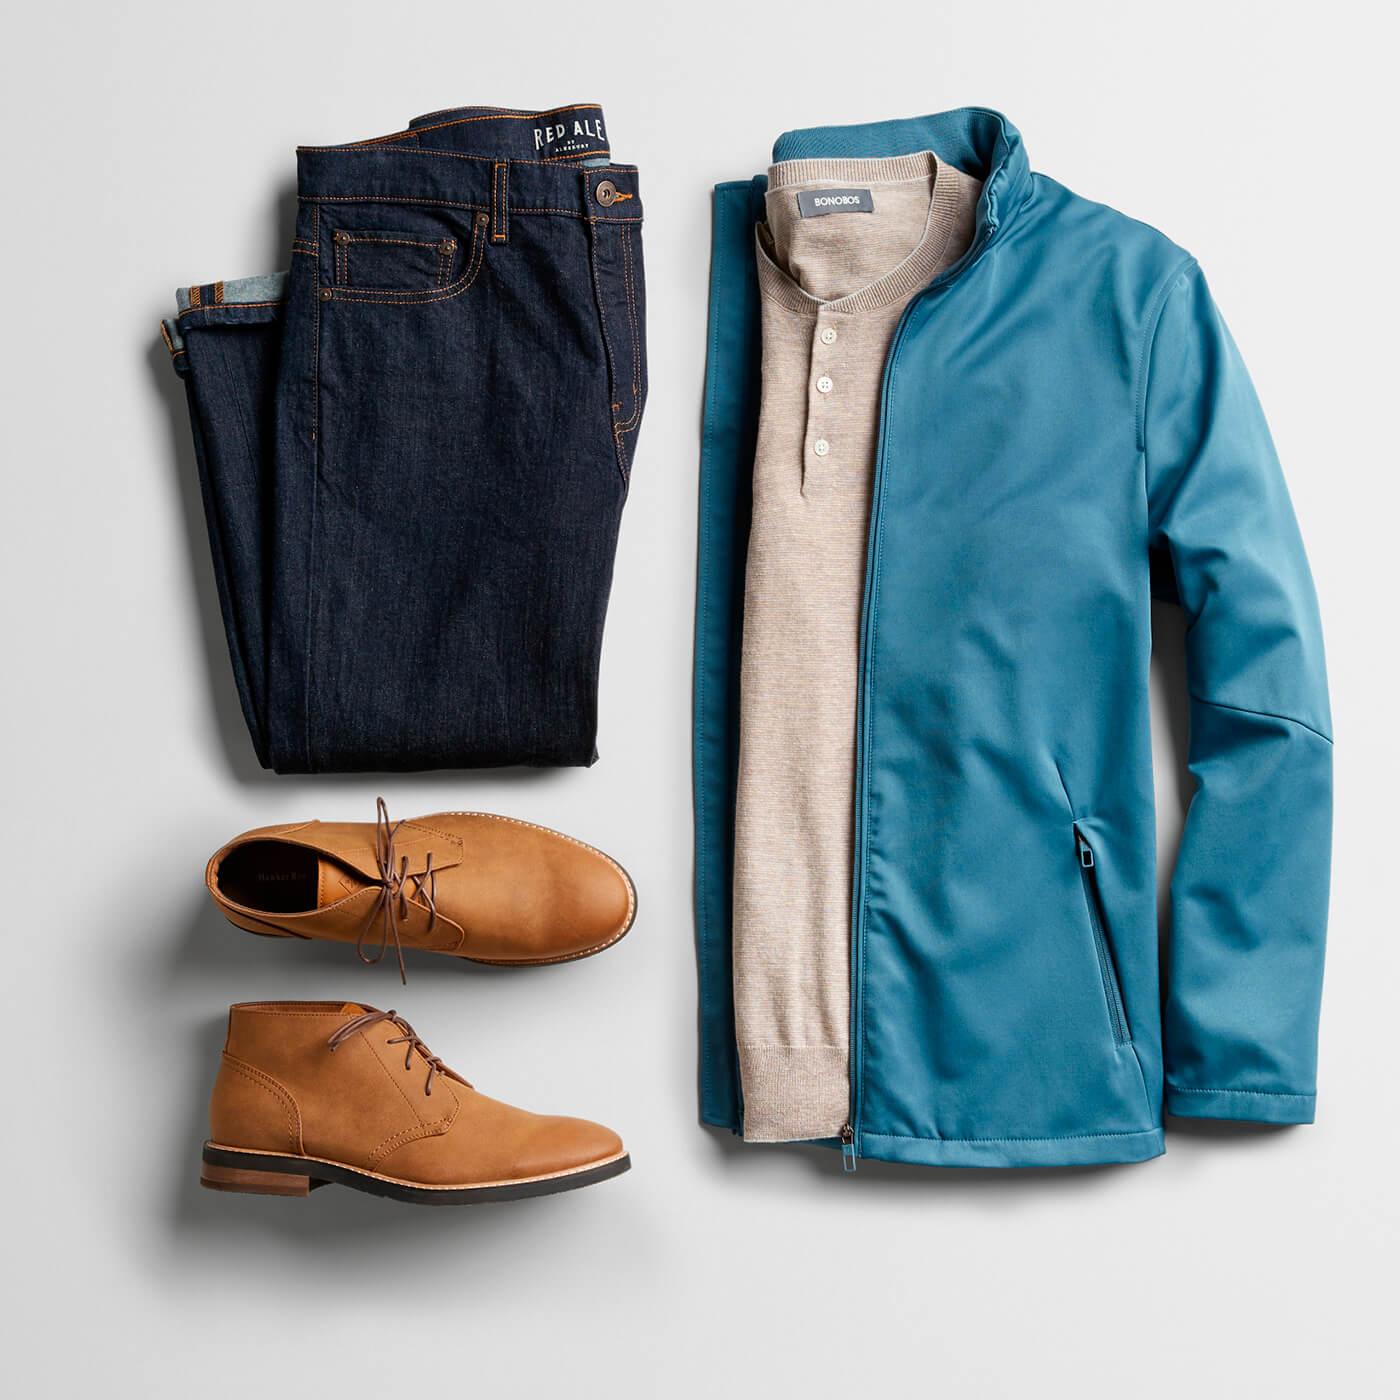 light blue jacket, tan henley, navy chinos and tan chukka boots